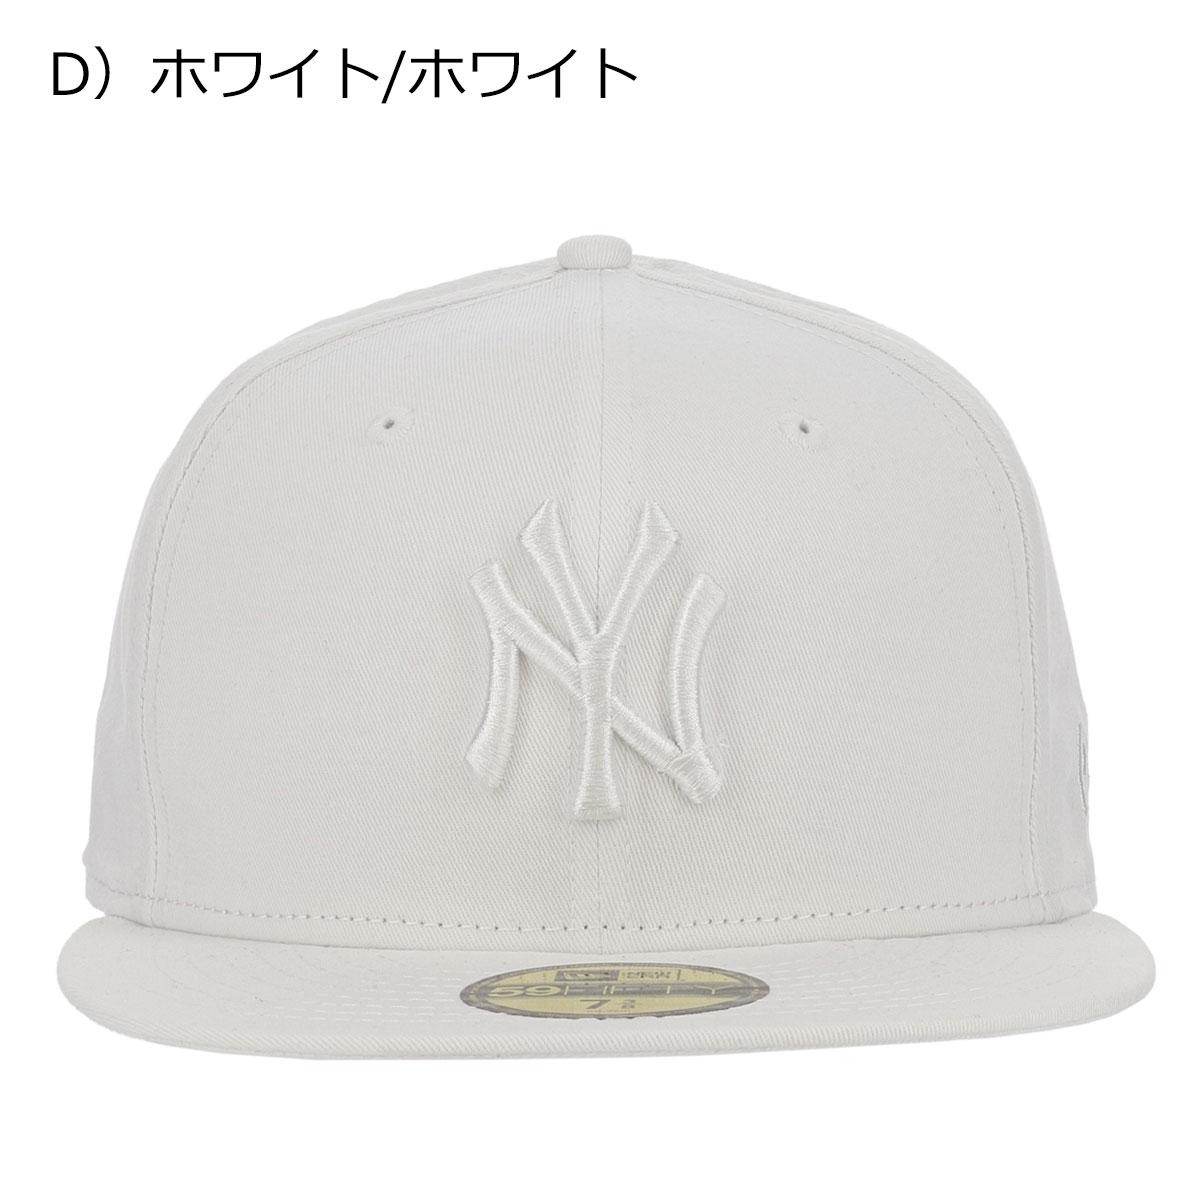 D)ホワイト/ホワイト